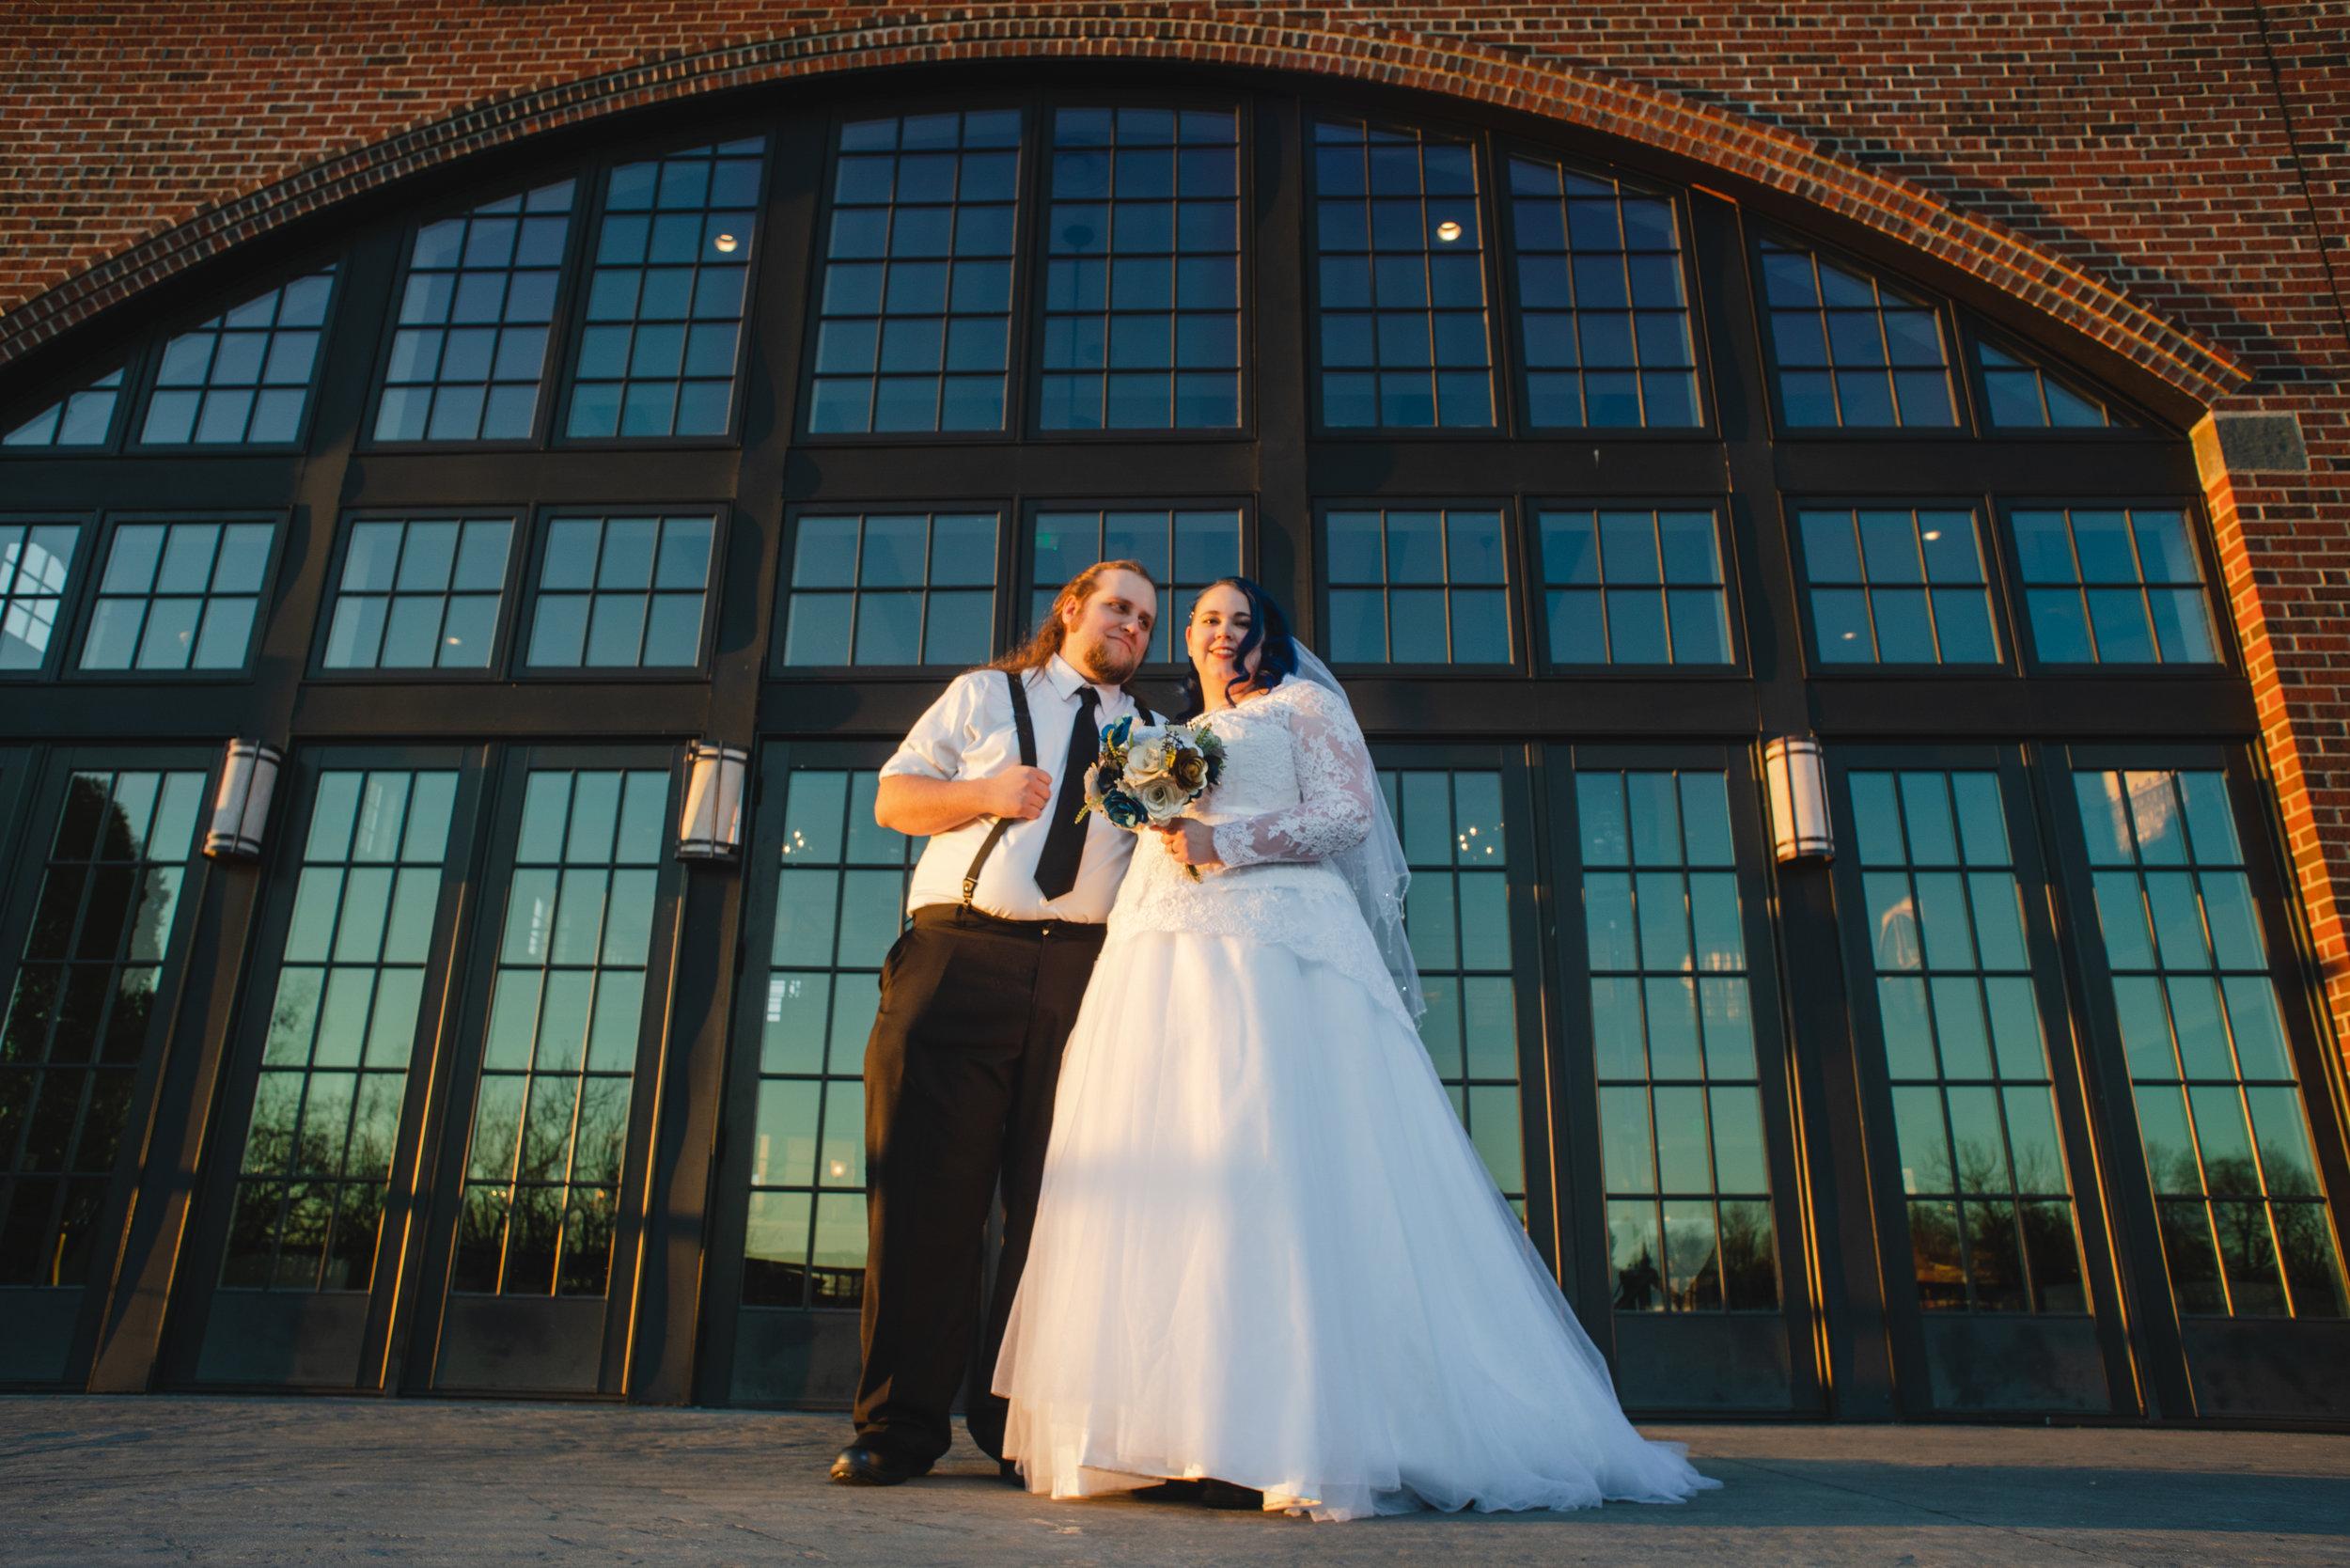 DSC00070.ARWRobin&matt_wedding_Danny11-11-20187522.jpg